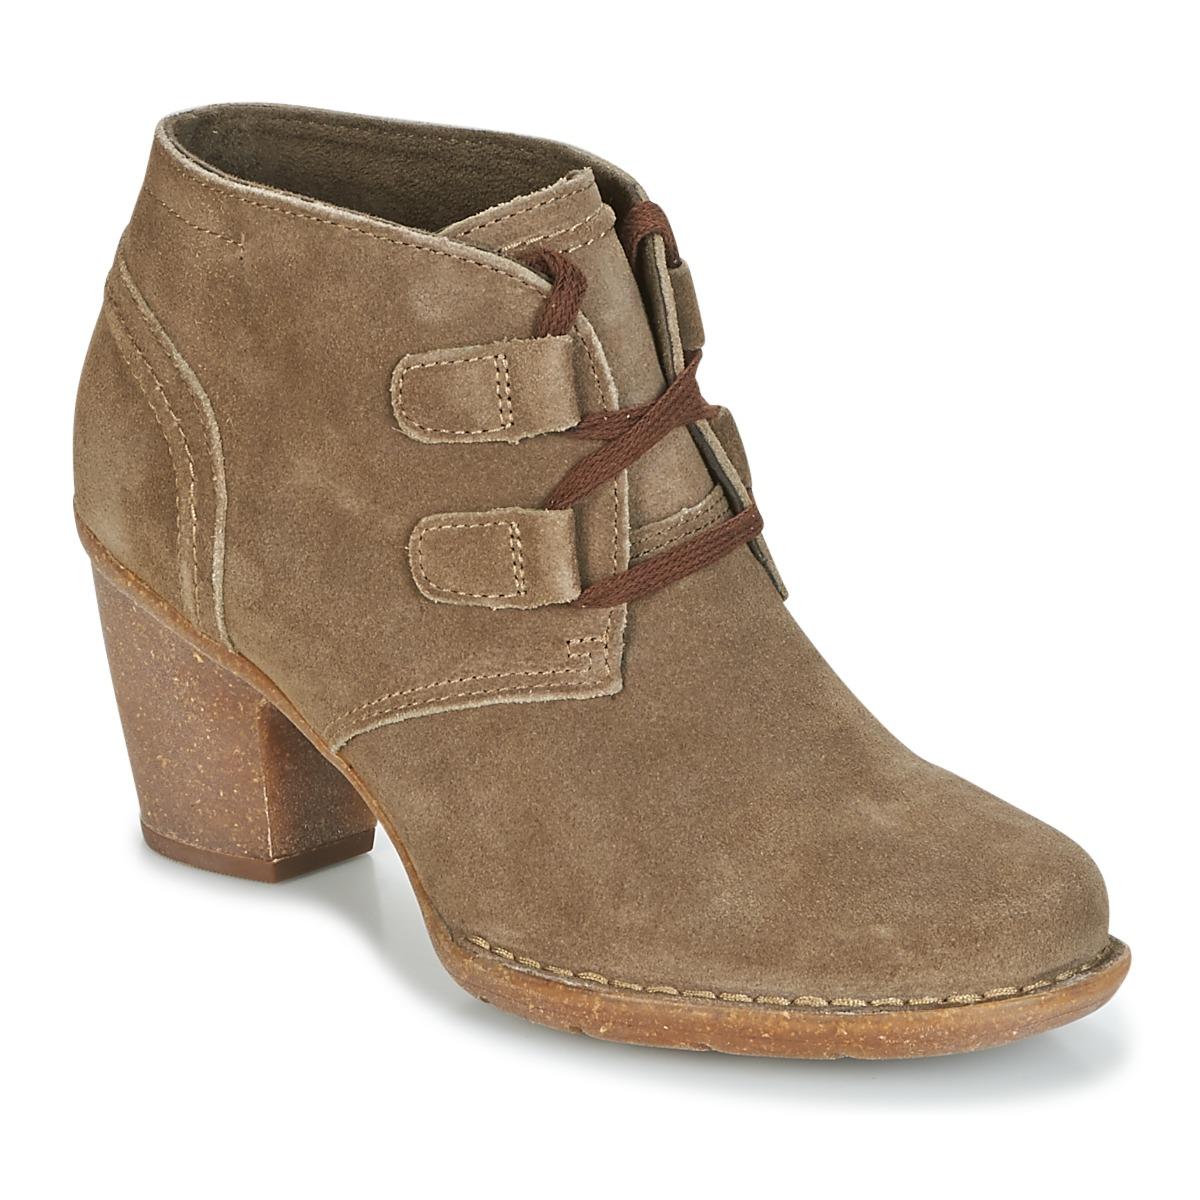 Clarks CARLETA LYON Khaki - Kostenloser Versand bei Spartoode ! - Schuhe Low Boots Damen 95,20 €